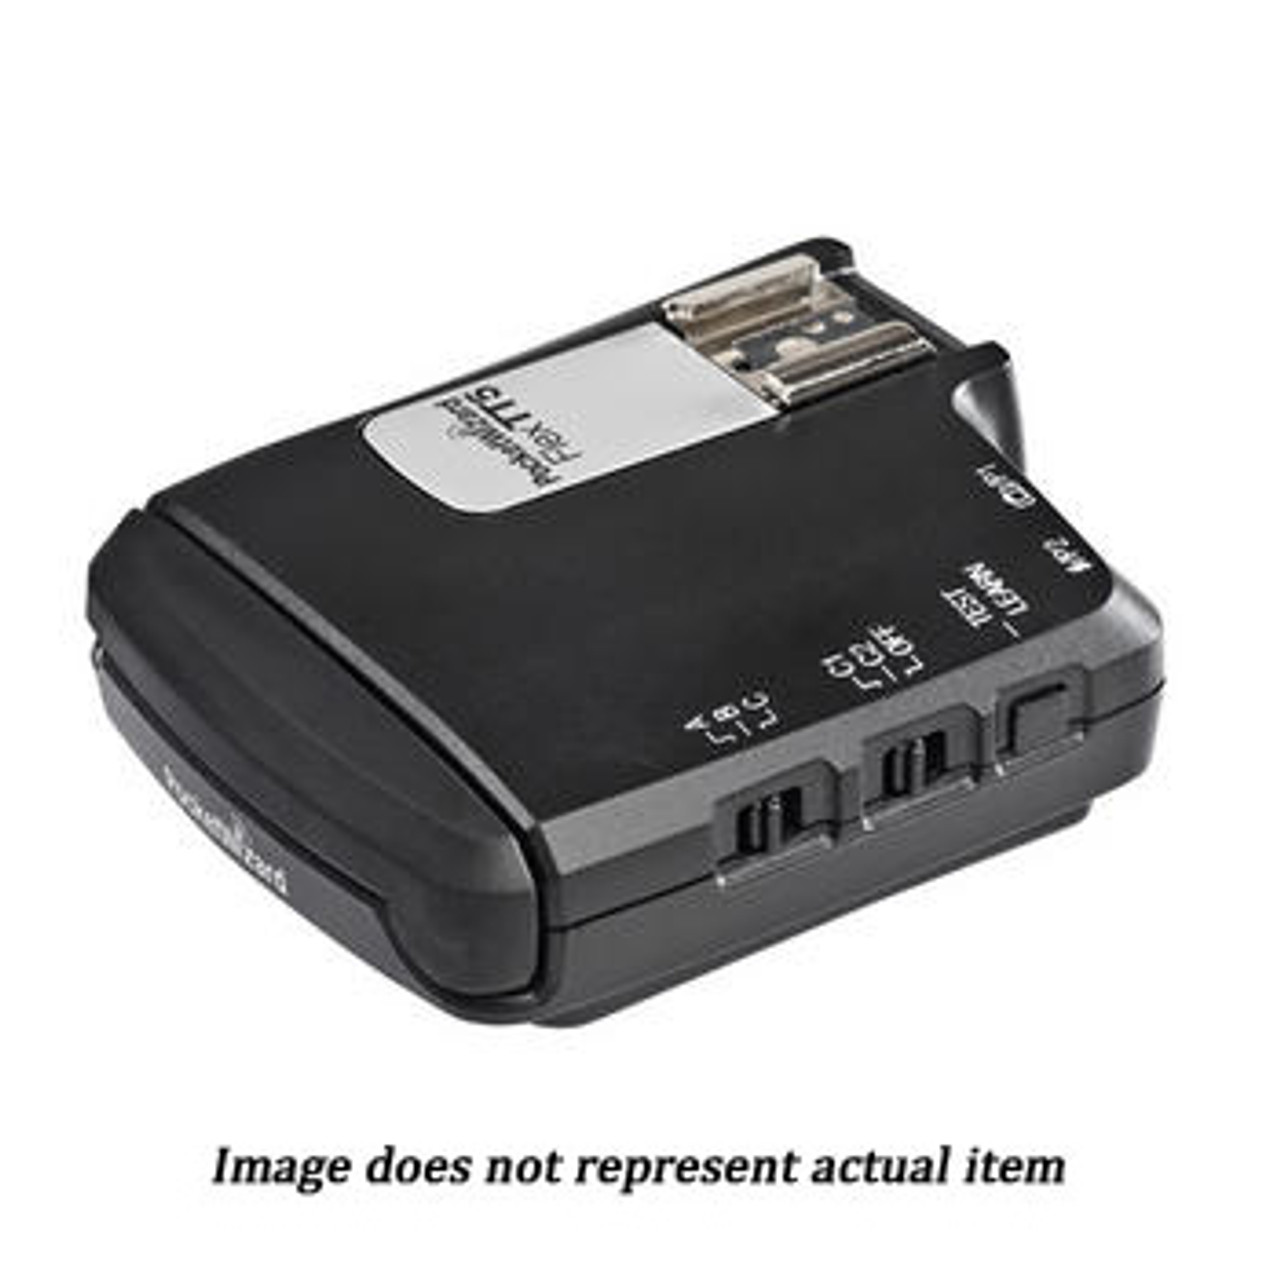 PocketWizard Flex TT5 Transceiver for Canon (USED) - S/N 5CU123818